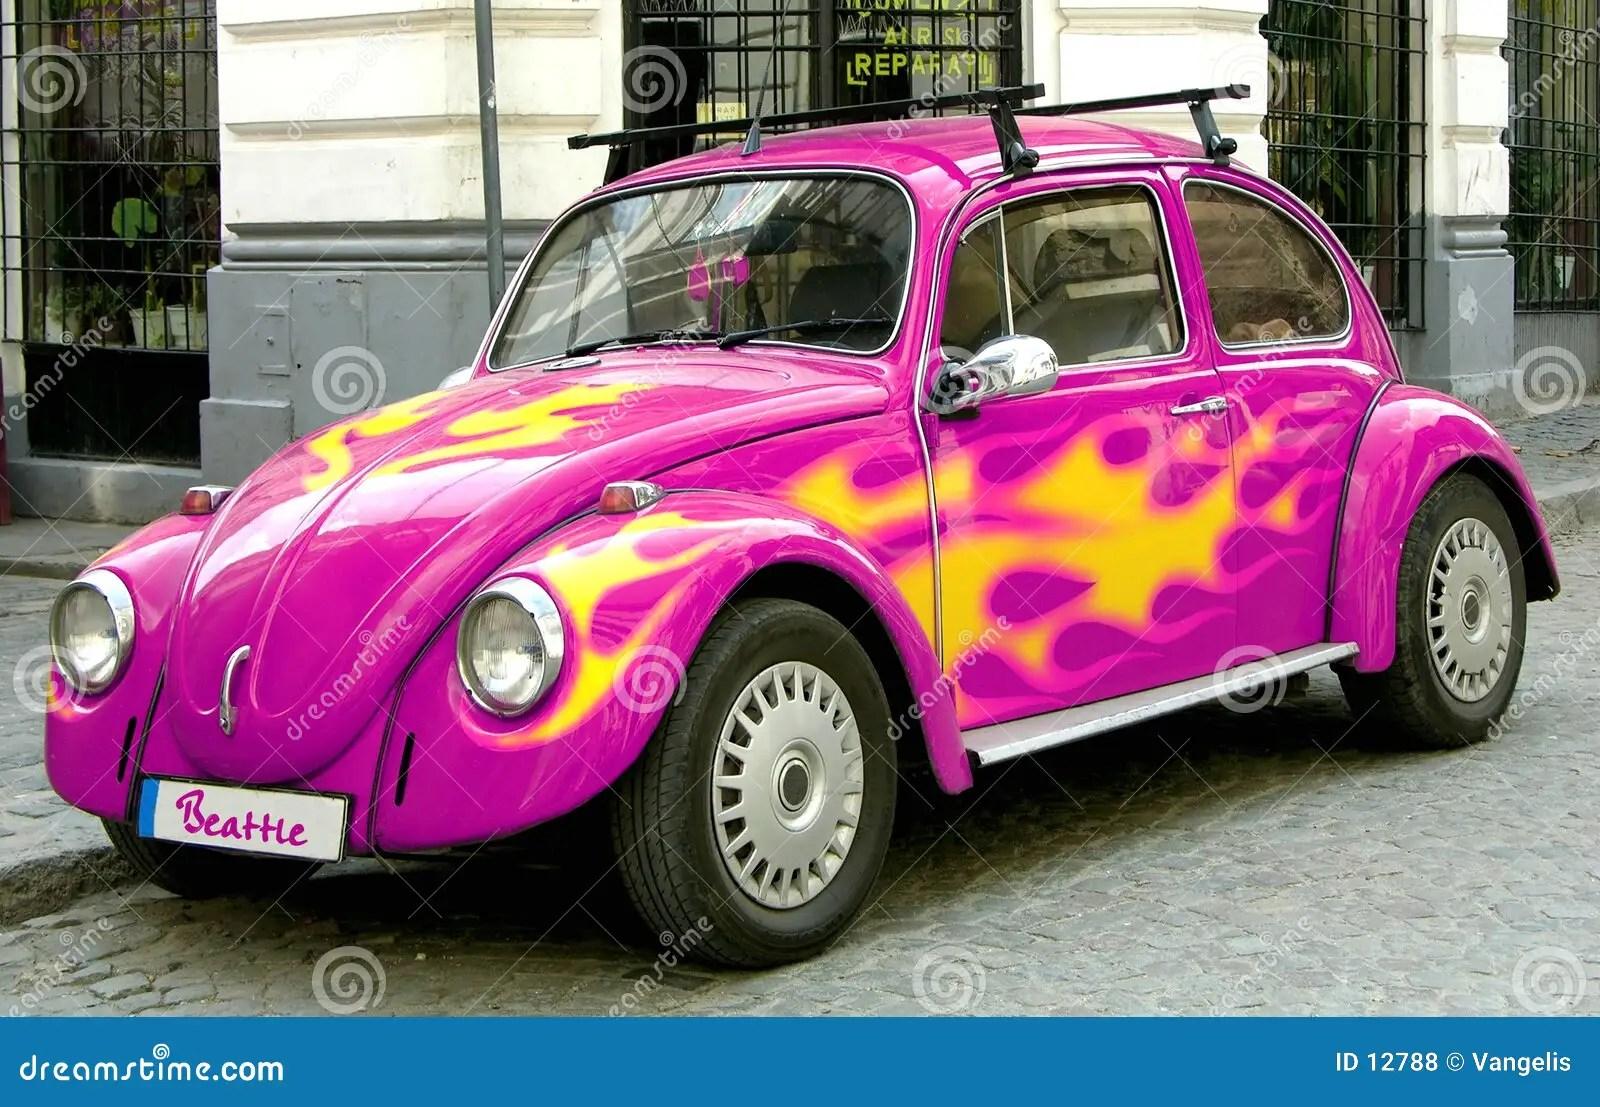 Cute Sloth Wallpaper Pink Beetle Bug Car